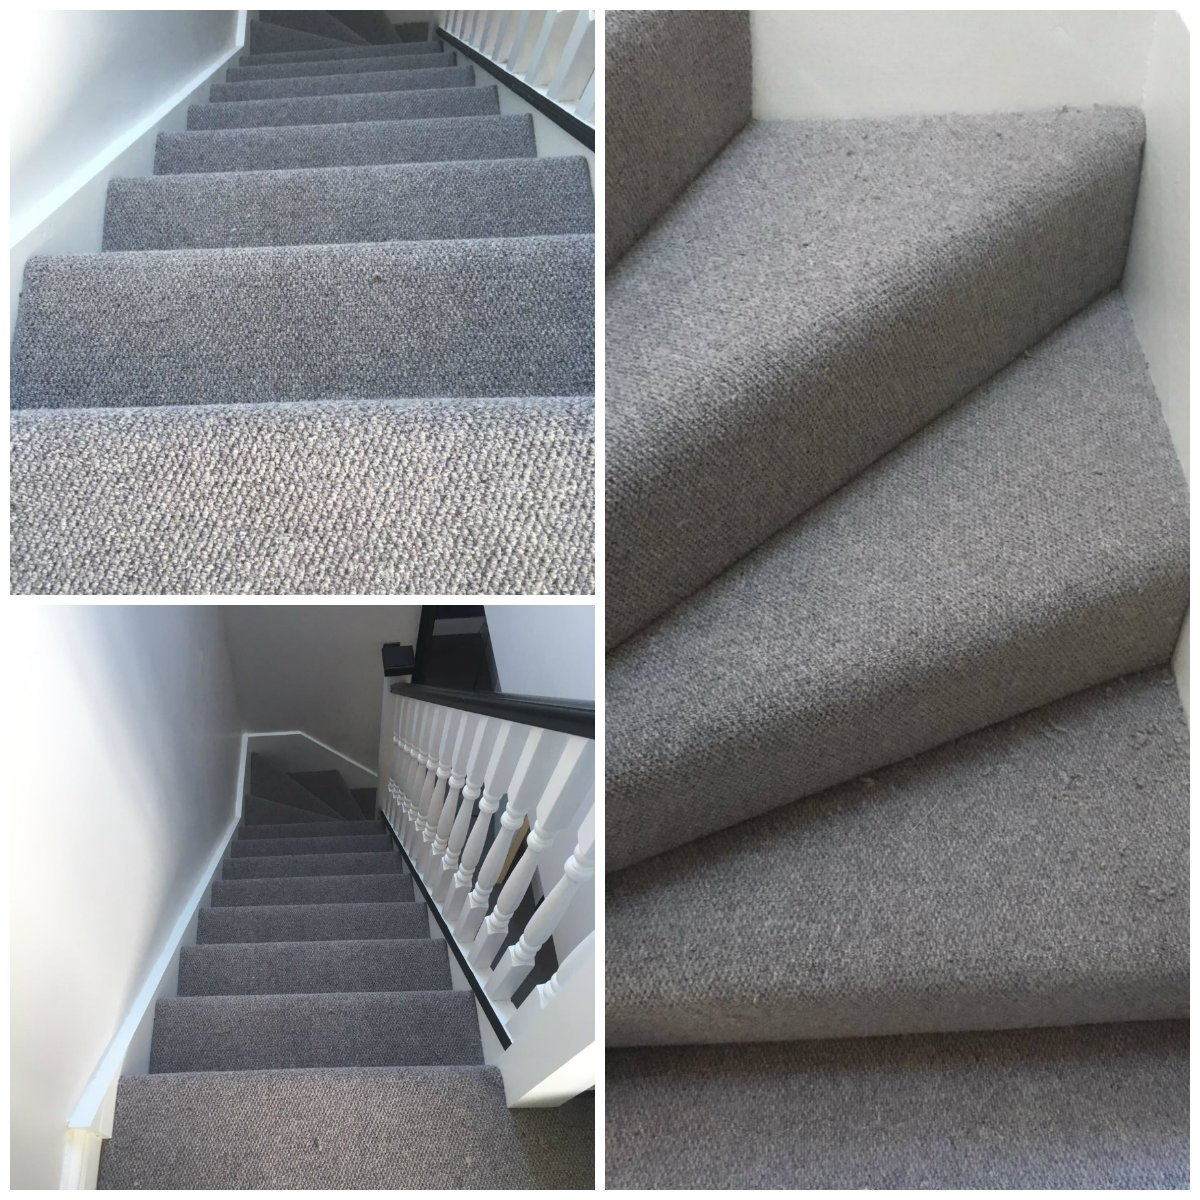 Blacklock Carpets On Twitter Durable Natural Habitat Carpet On   Tweed Carpet For Stairs   Adam   Modern   Mustard   Hard Wearing   Wool